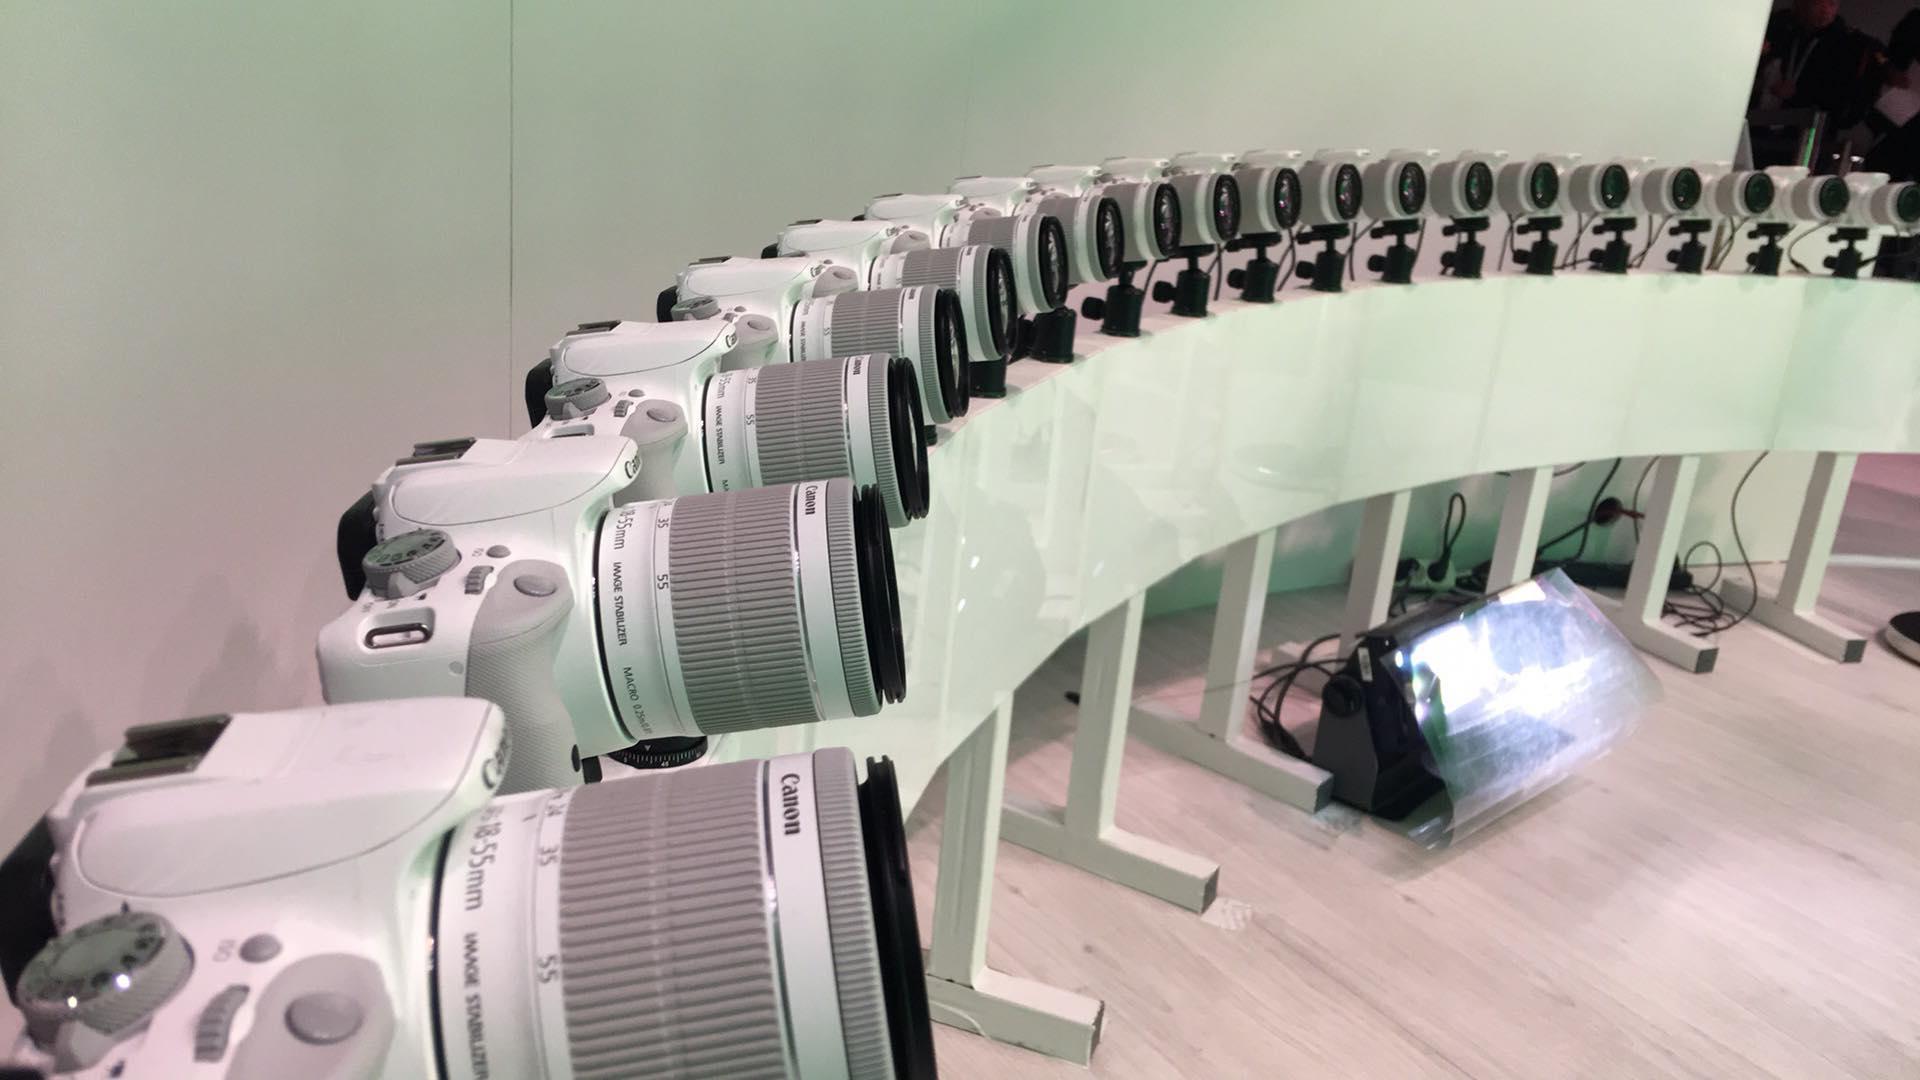 20 Canon DSLR